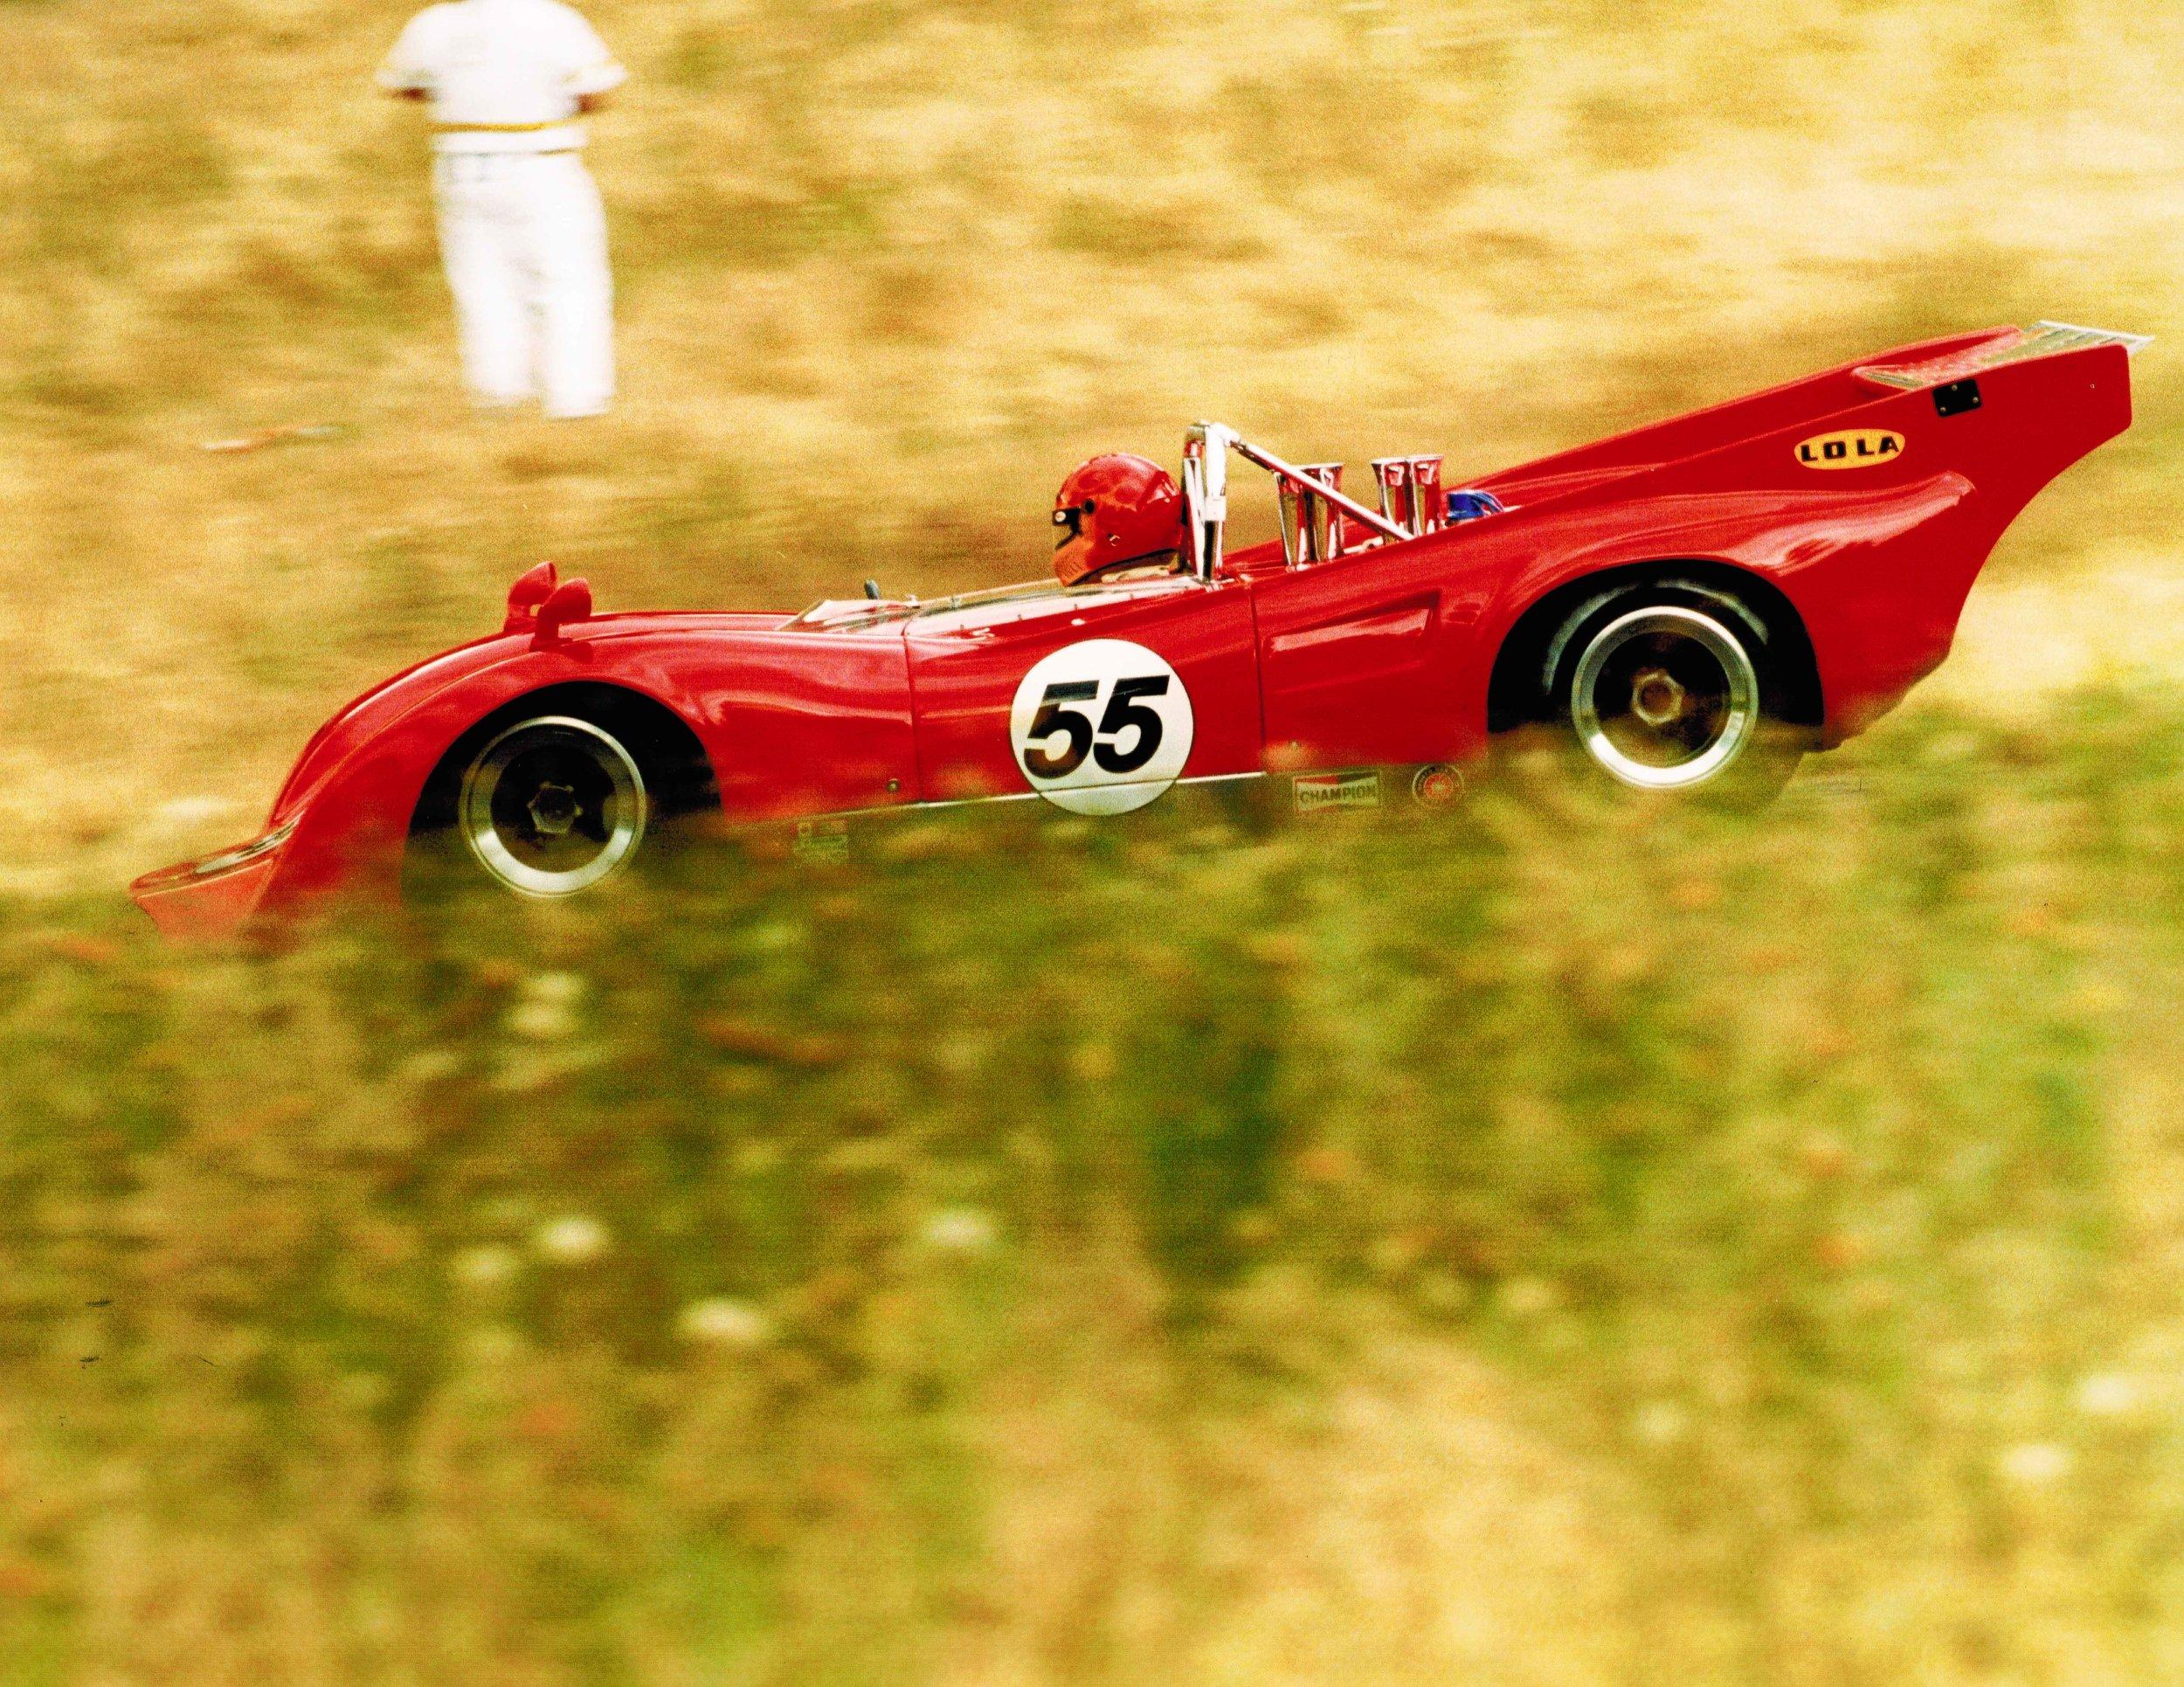 1969 Lola T162 Can Am Race Car — Northwest European